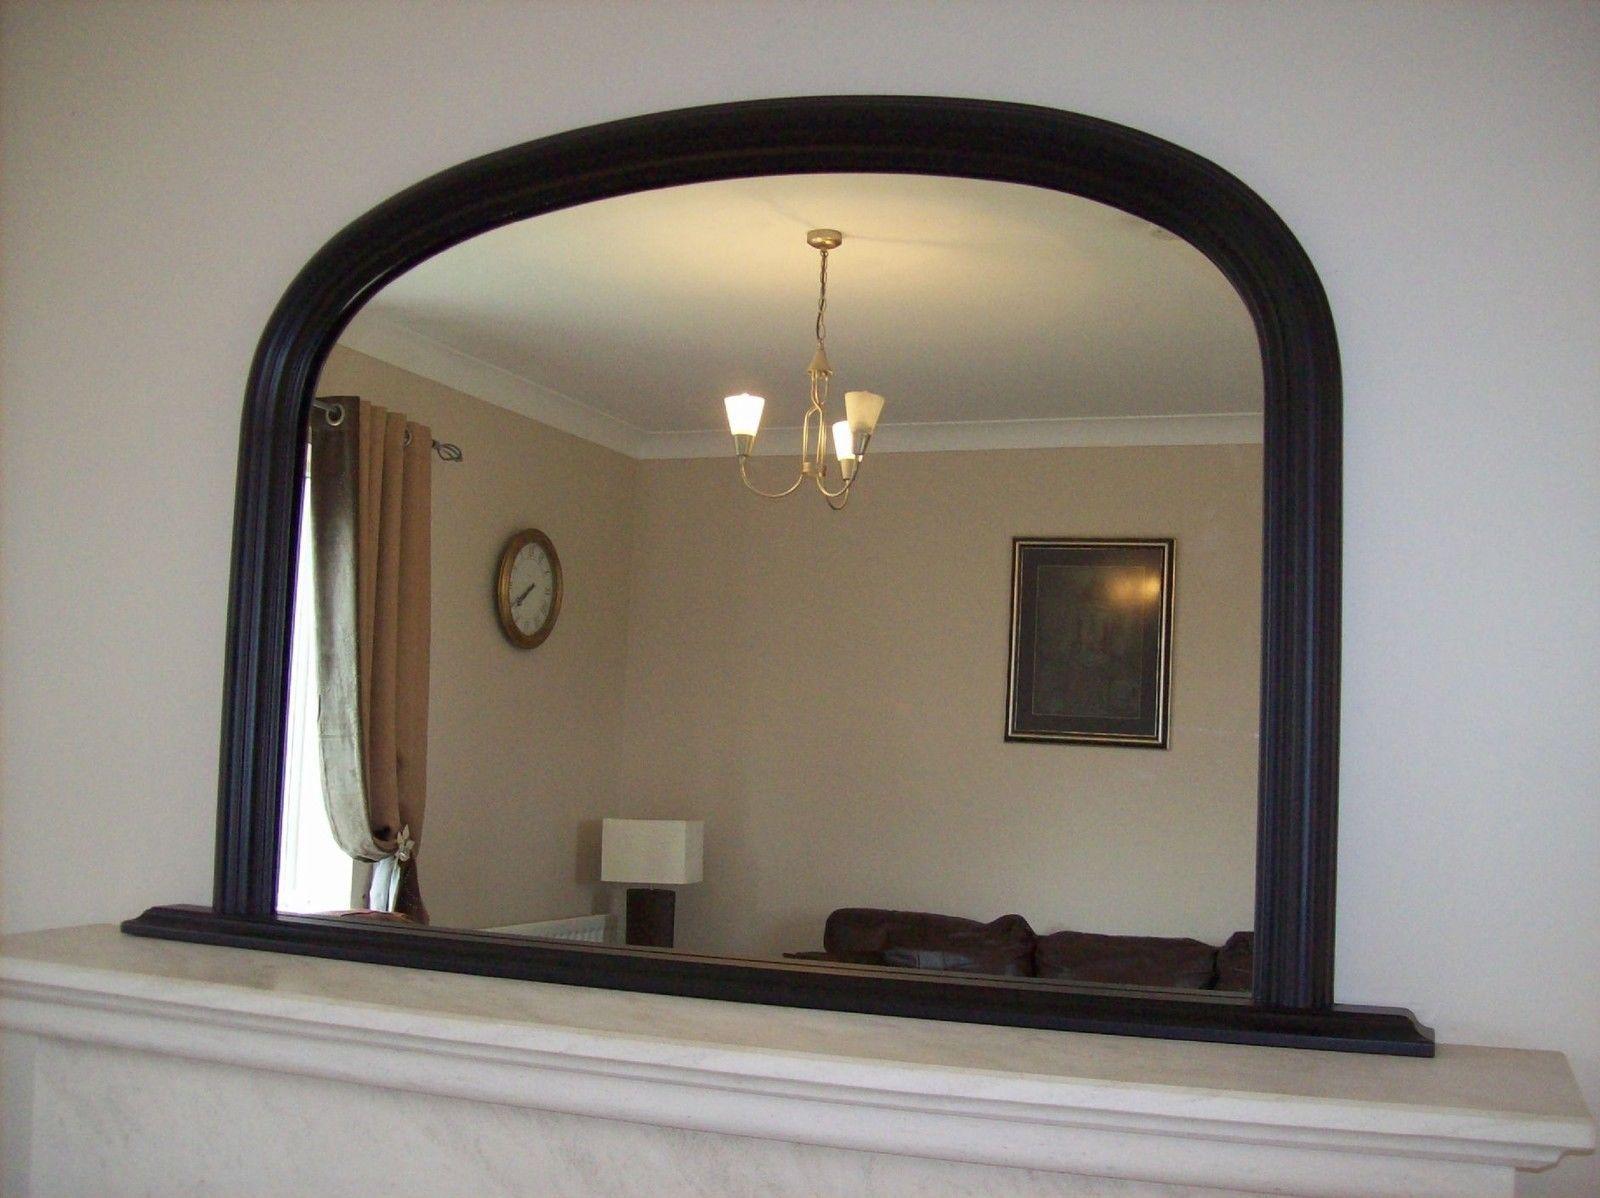 Large Black Arched Over Mantle Mirror 47x31 120cm X 79cm